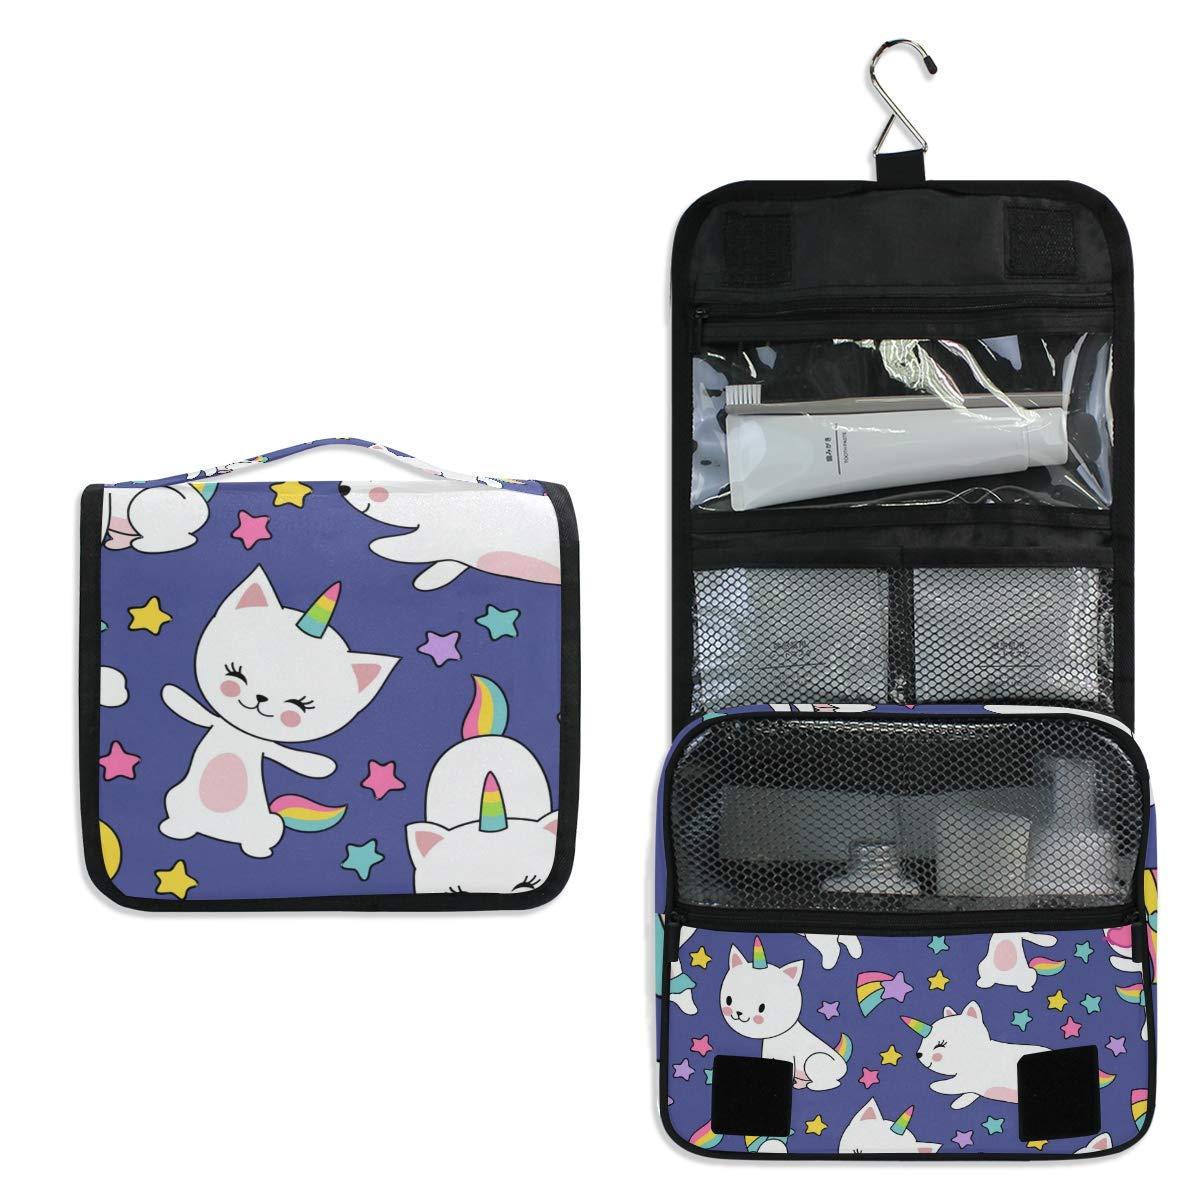 Toiletry Bag Travel Bag Hanging Hook - Watercolor Animal Waterproof Cosmetic Bag Portable Makeup Pouch for Toiletries Bathroom